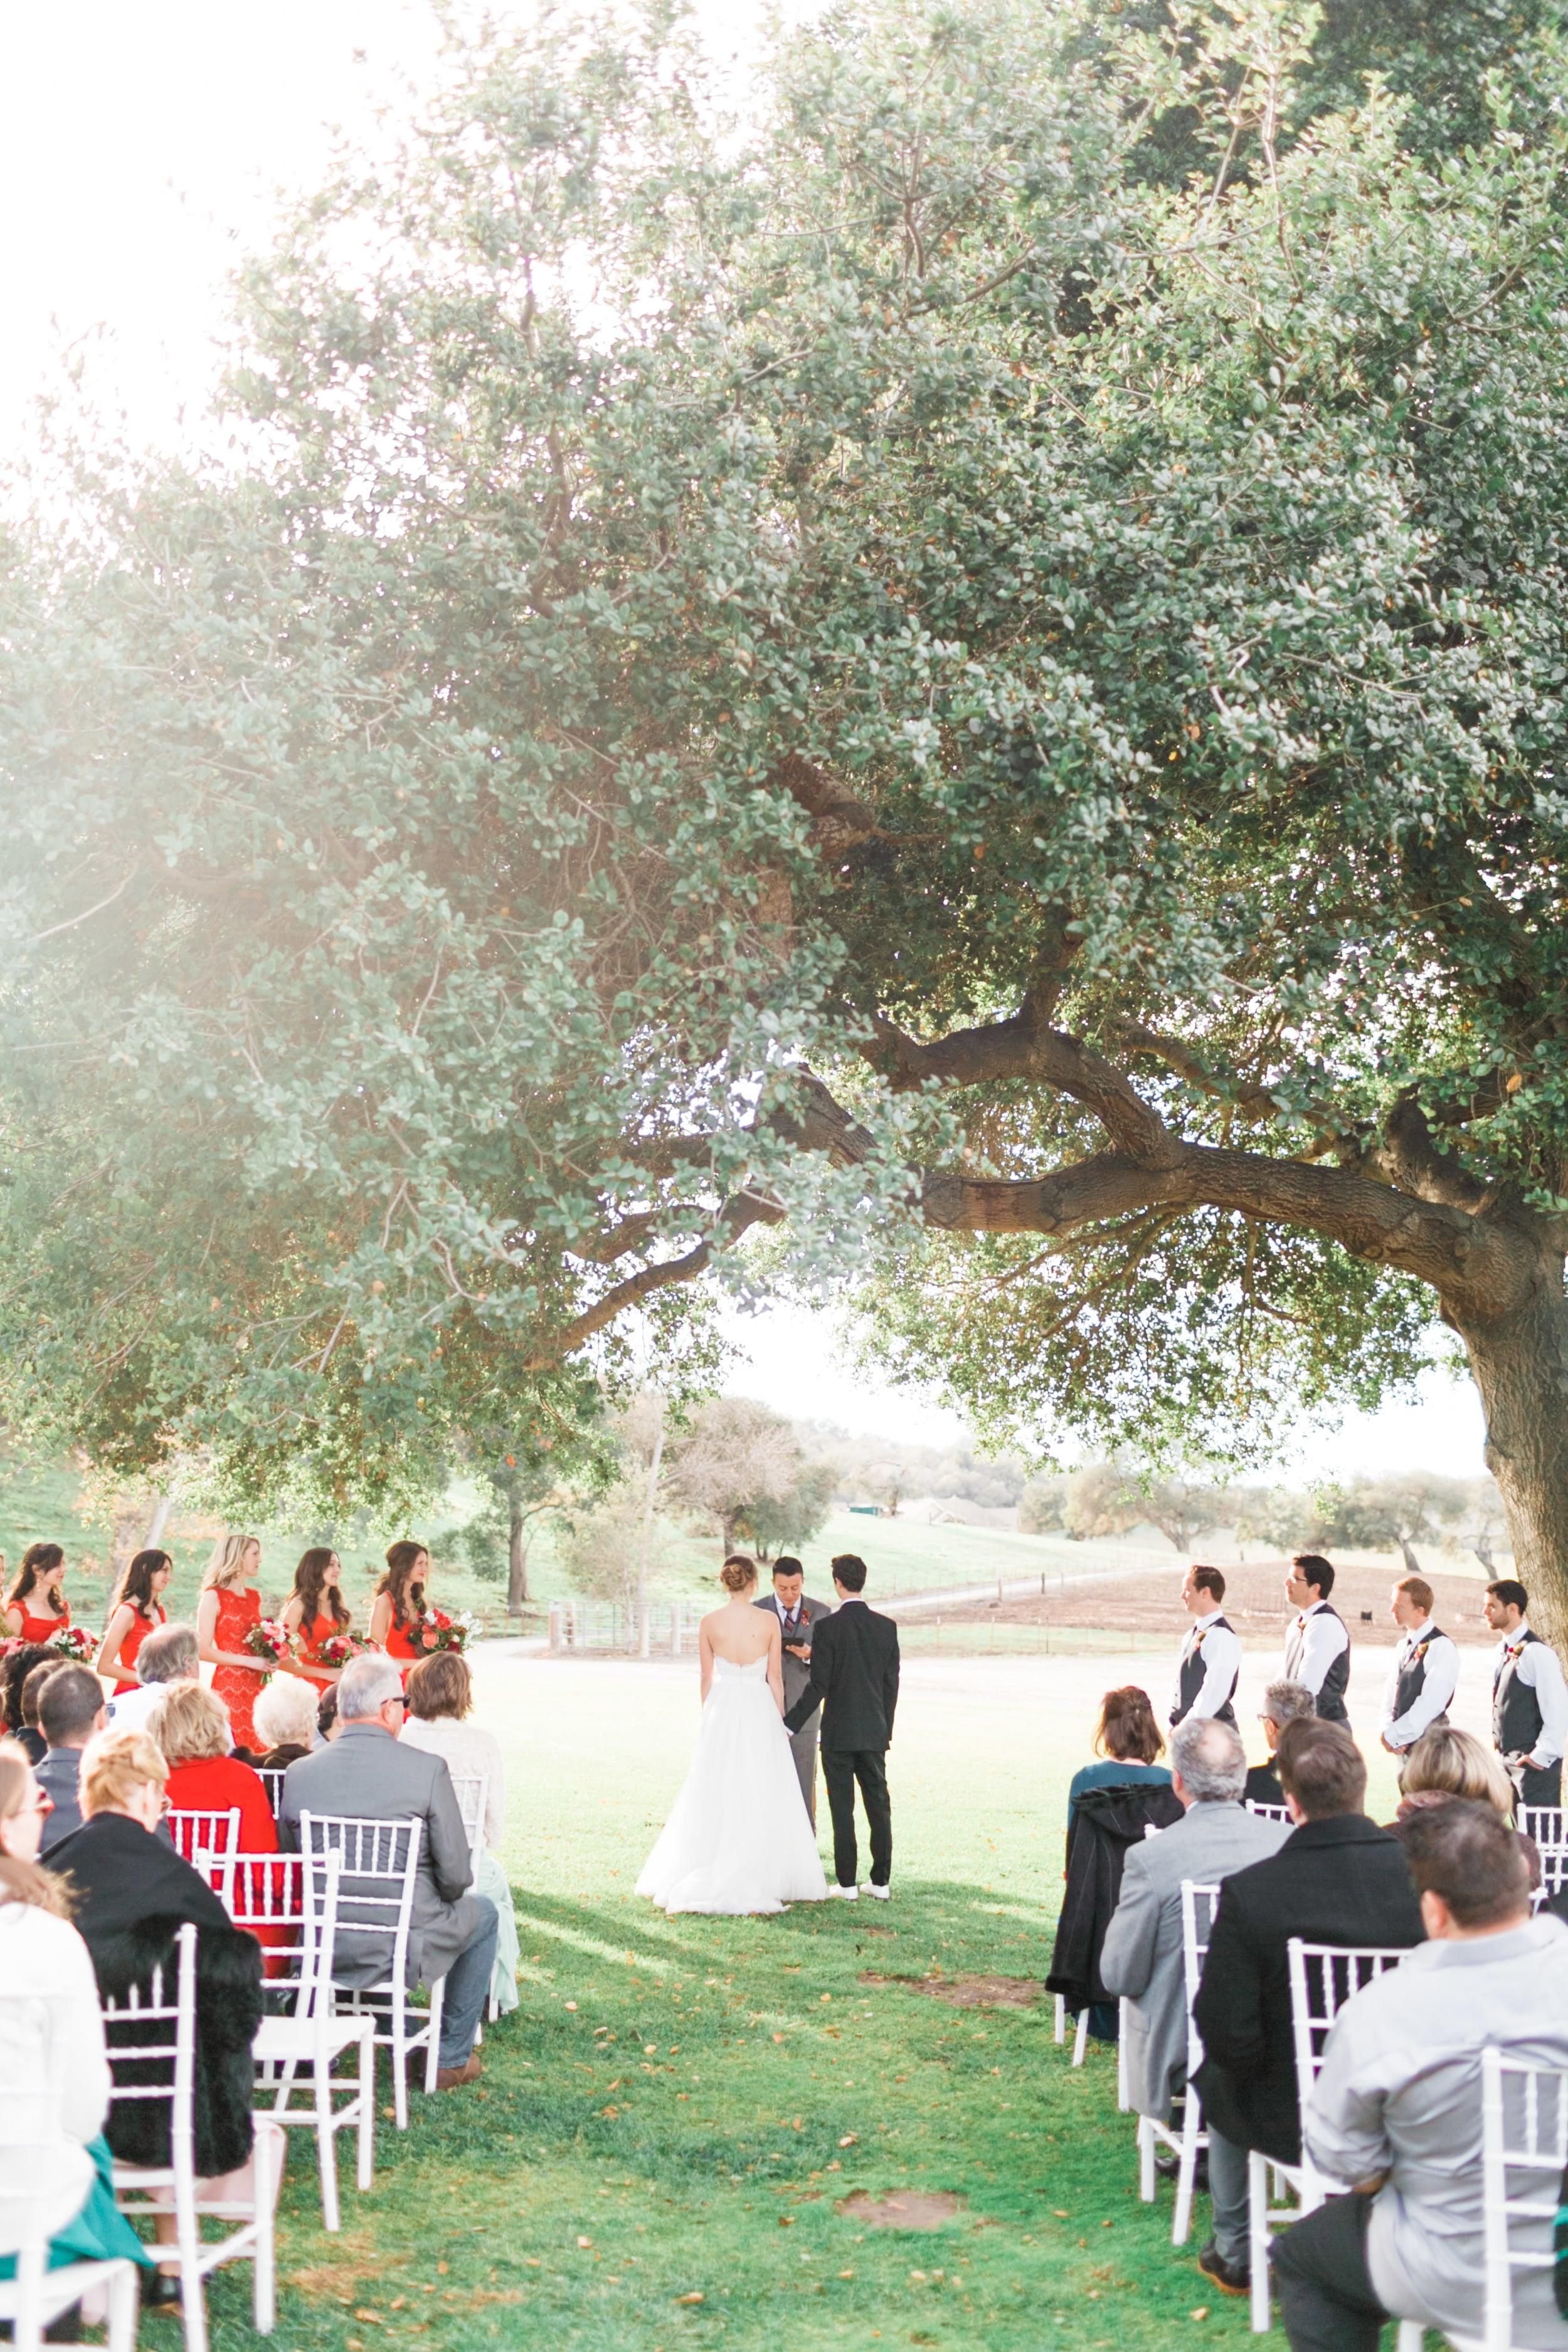 Natalie_Schutt_Photography_Winter_Wedding_San_Luis_Obispo-108.jpg